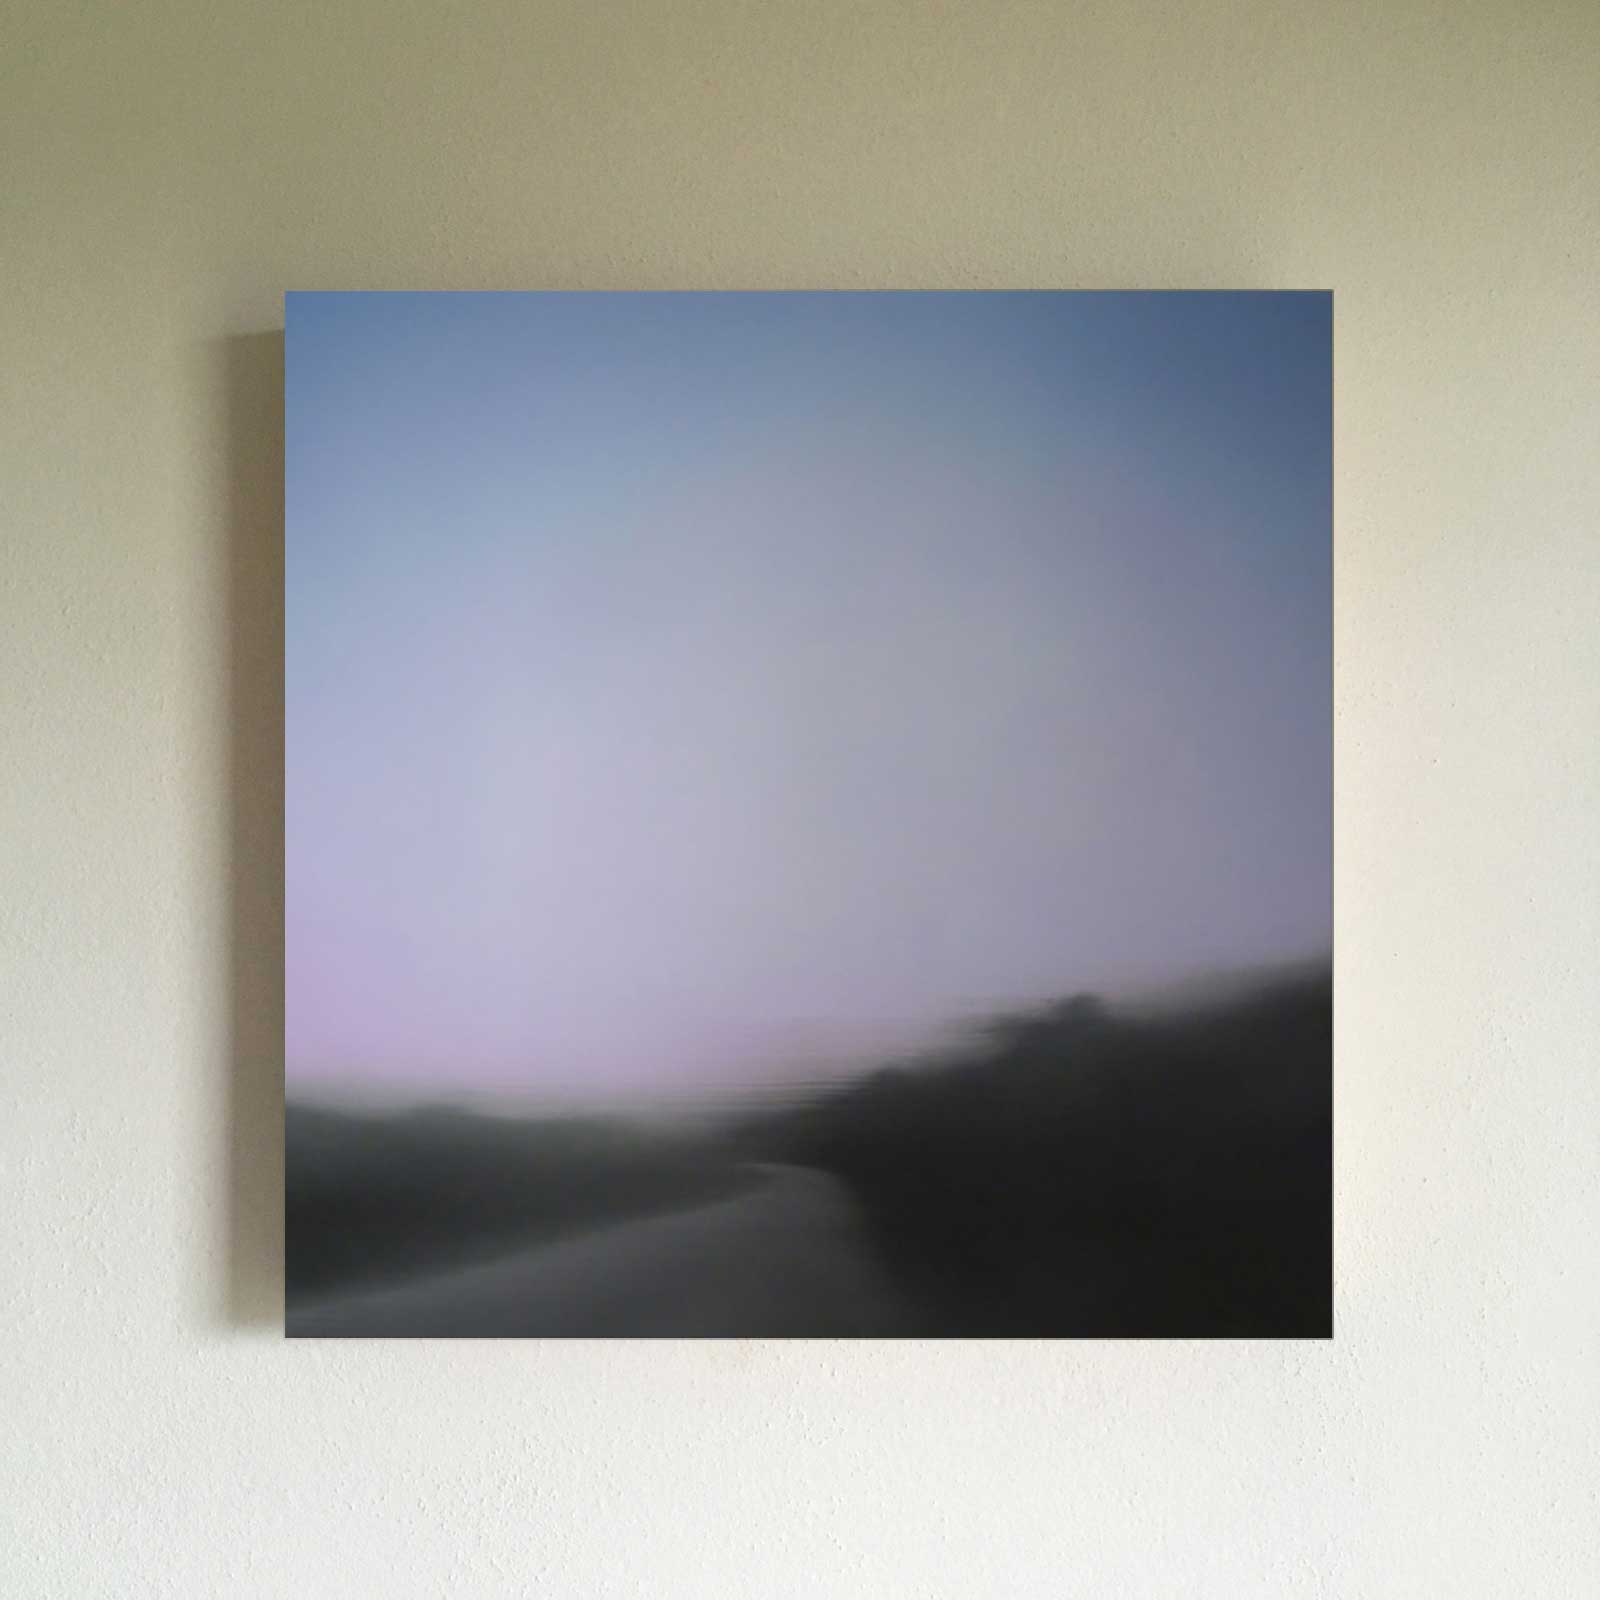 T#91-2012, oil on canvas, 45x45cm, priv. coll.